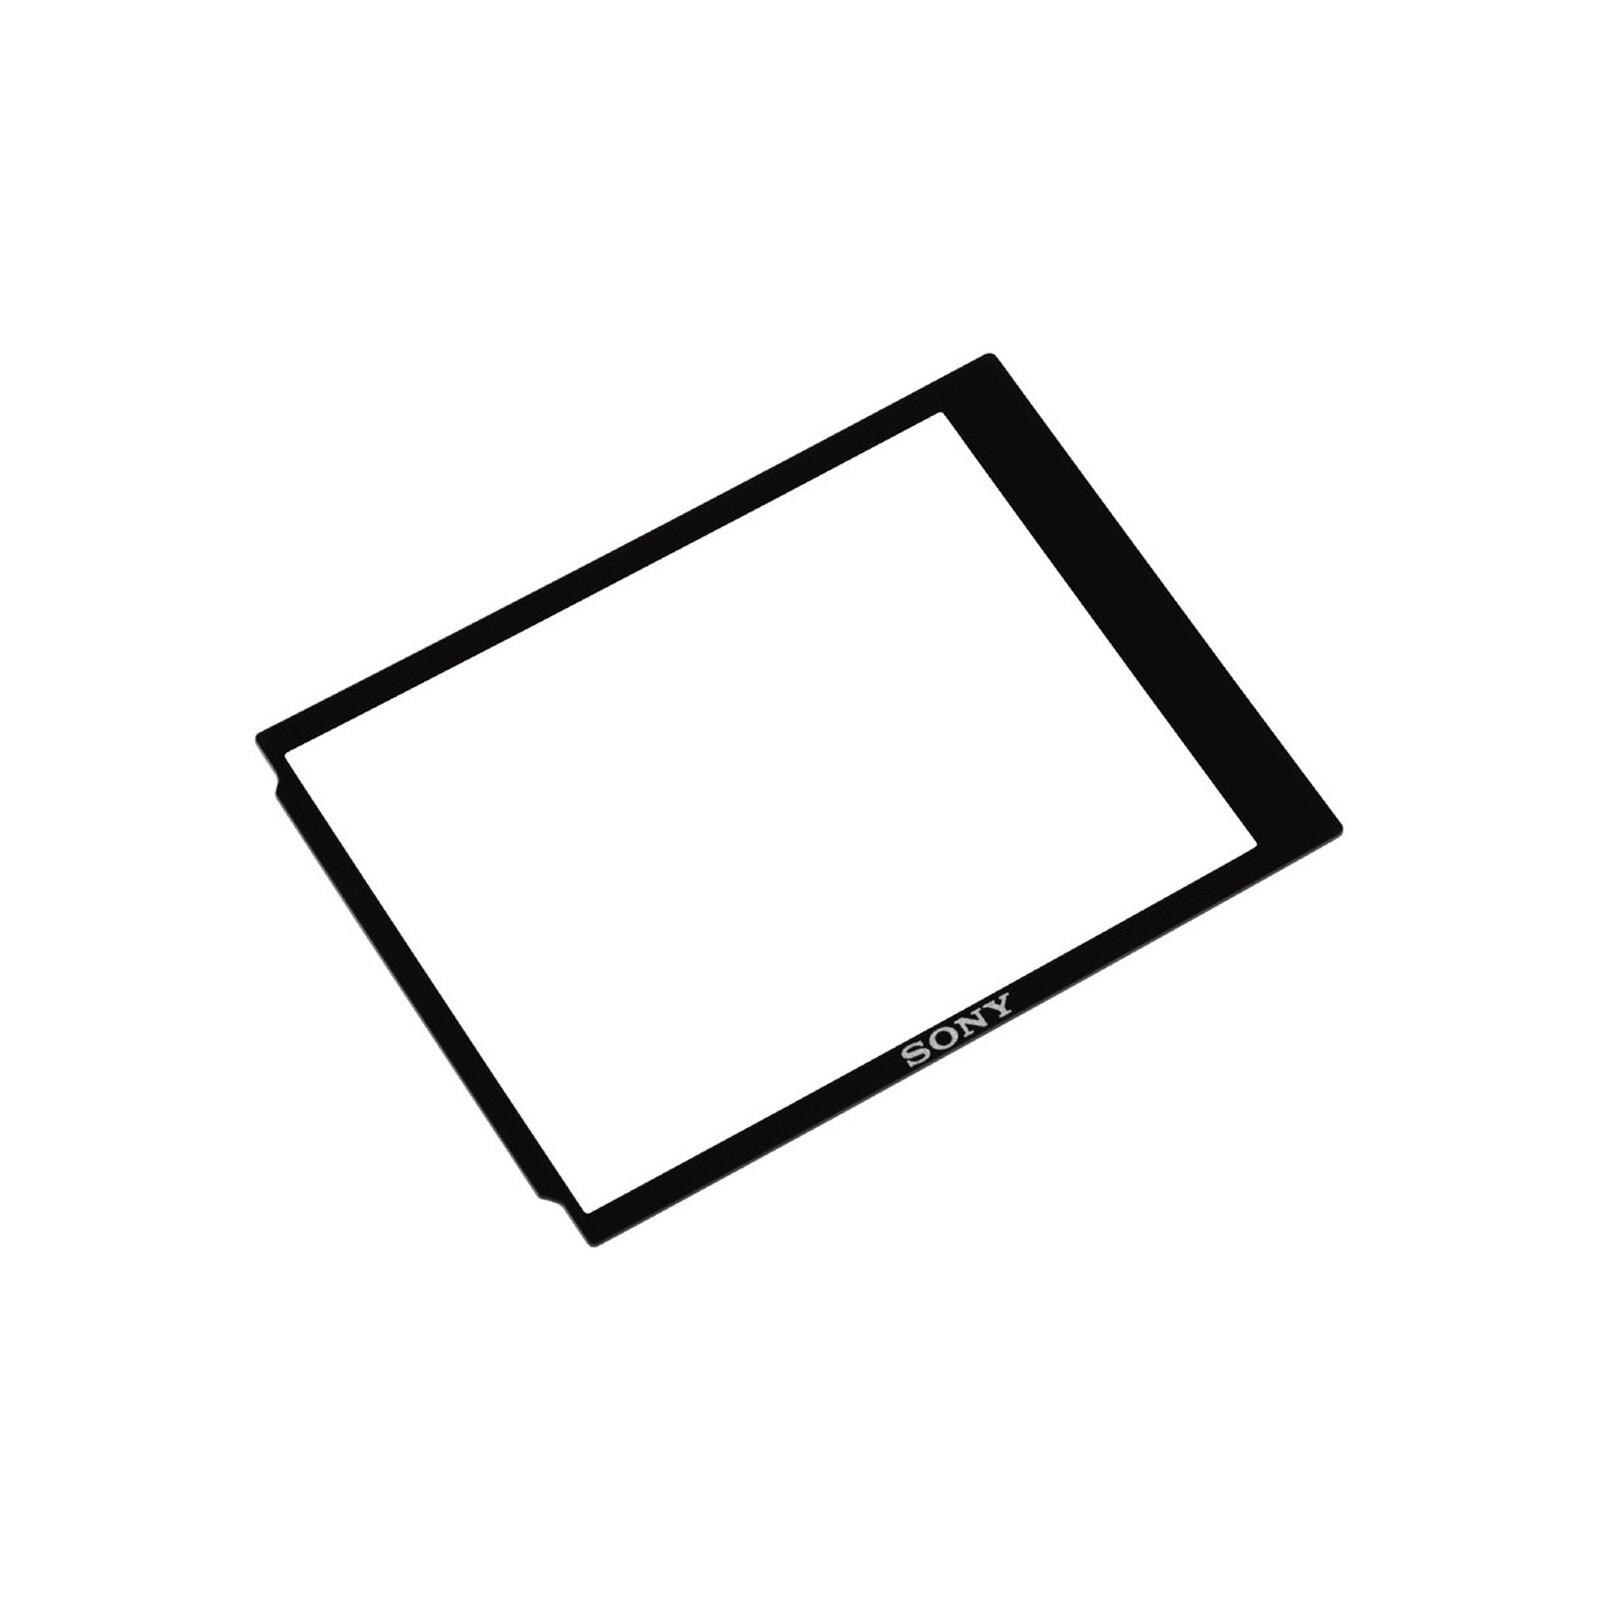 Sony PCK-LM15 Schutzfolie